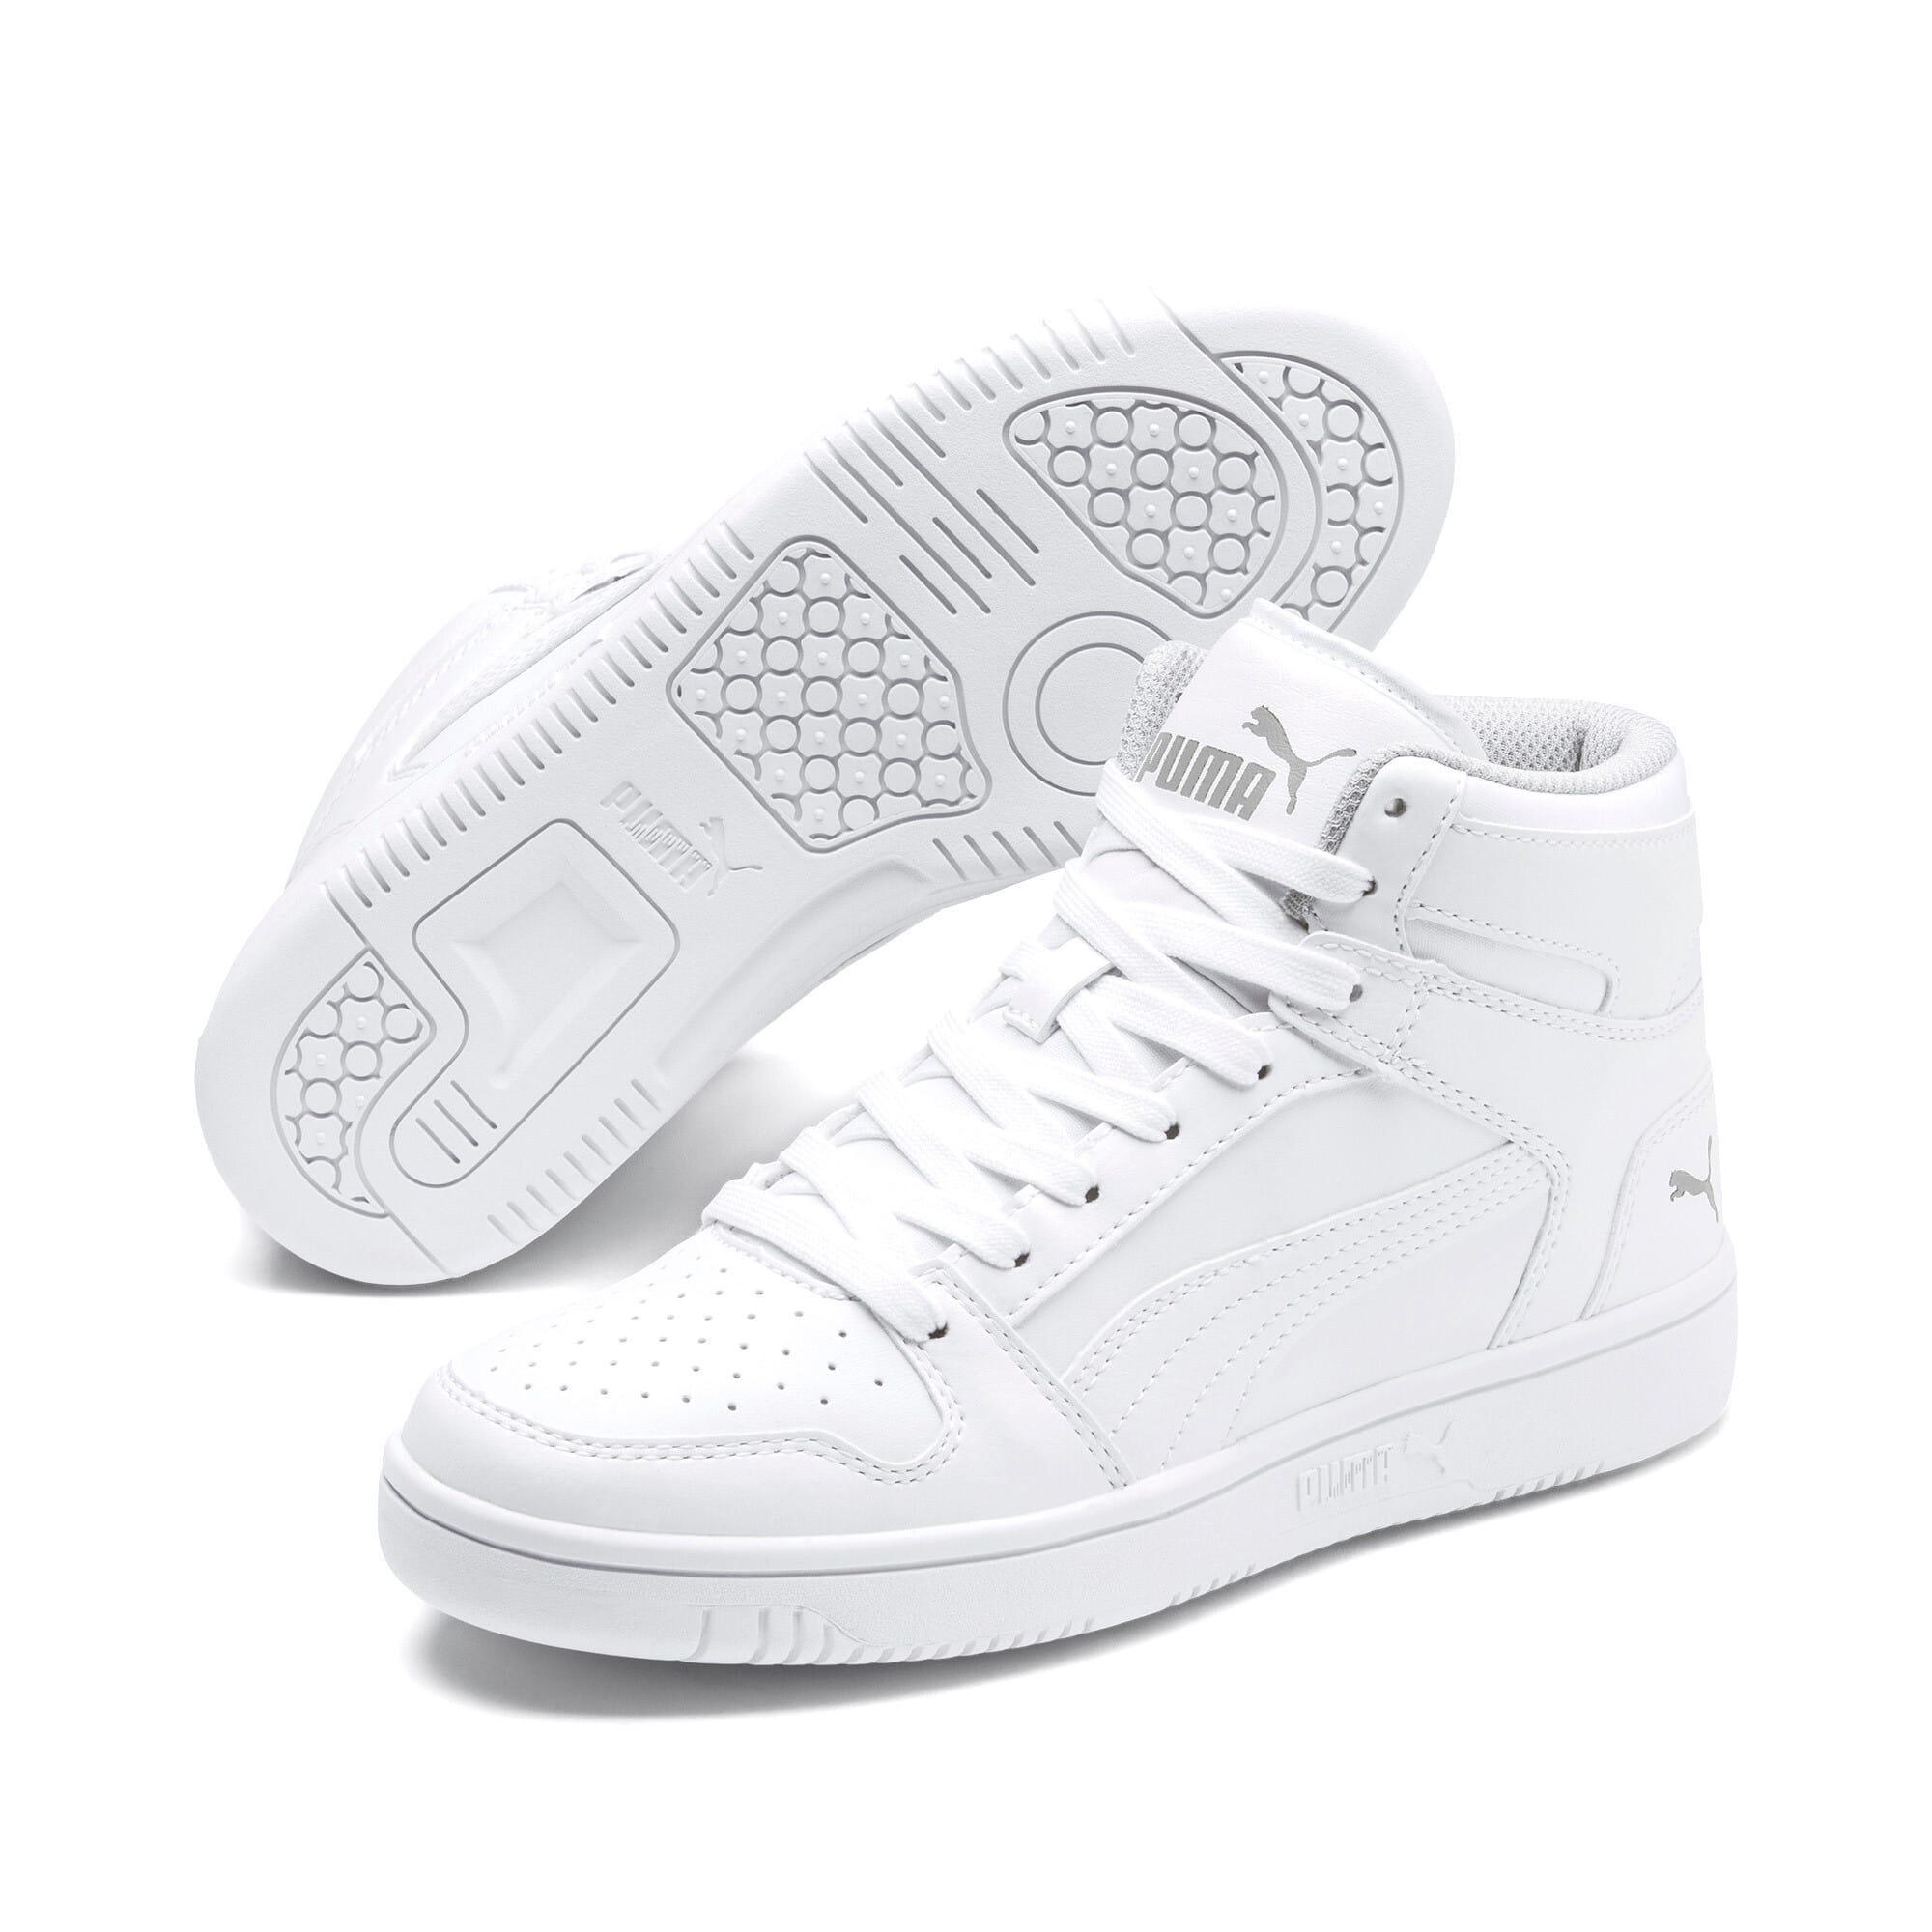 Thumbnail 2 of PUMA Rebound LayUp Mid Sneakers JR, Puma White-Gray Violet, medium